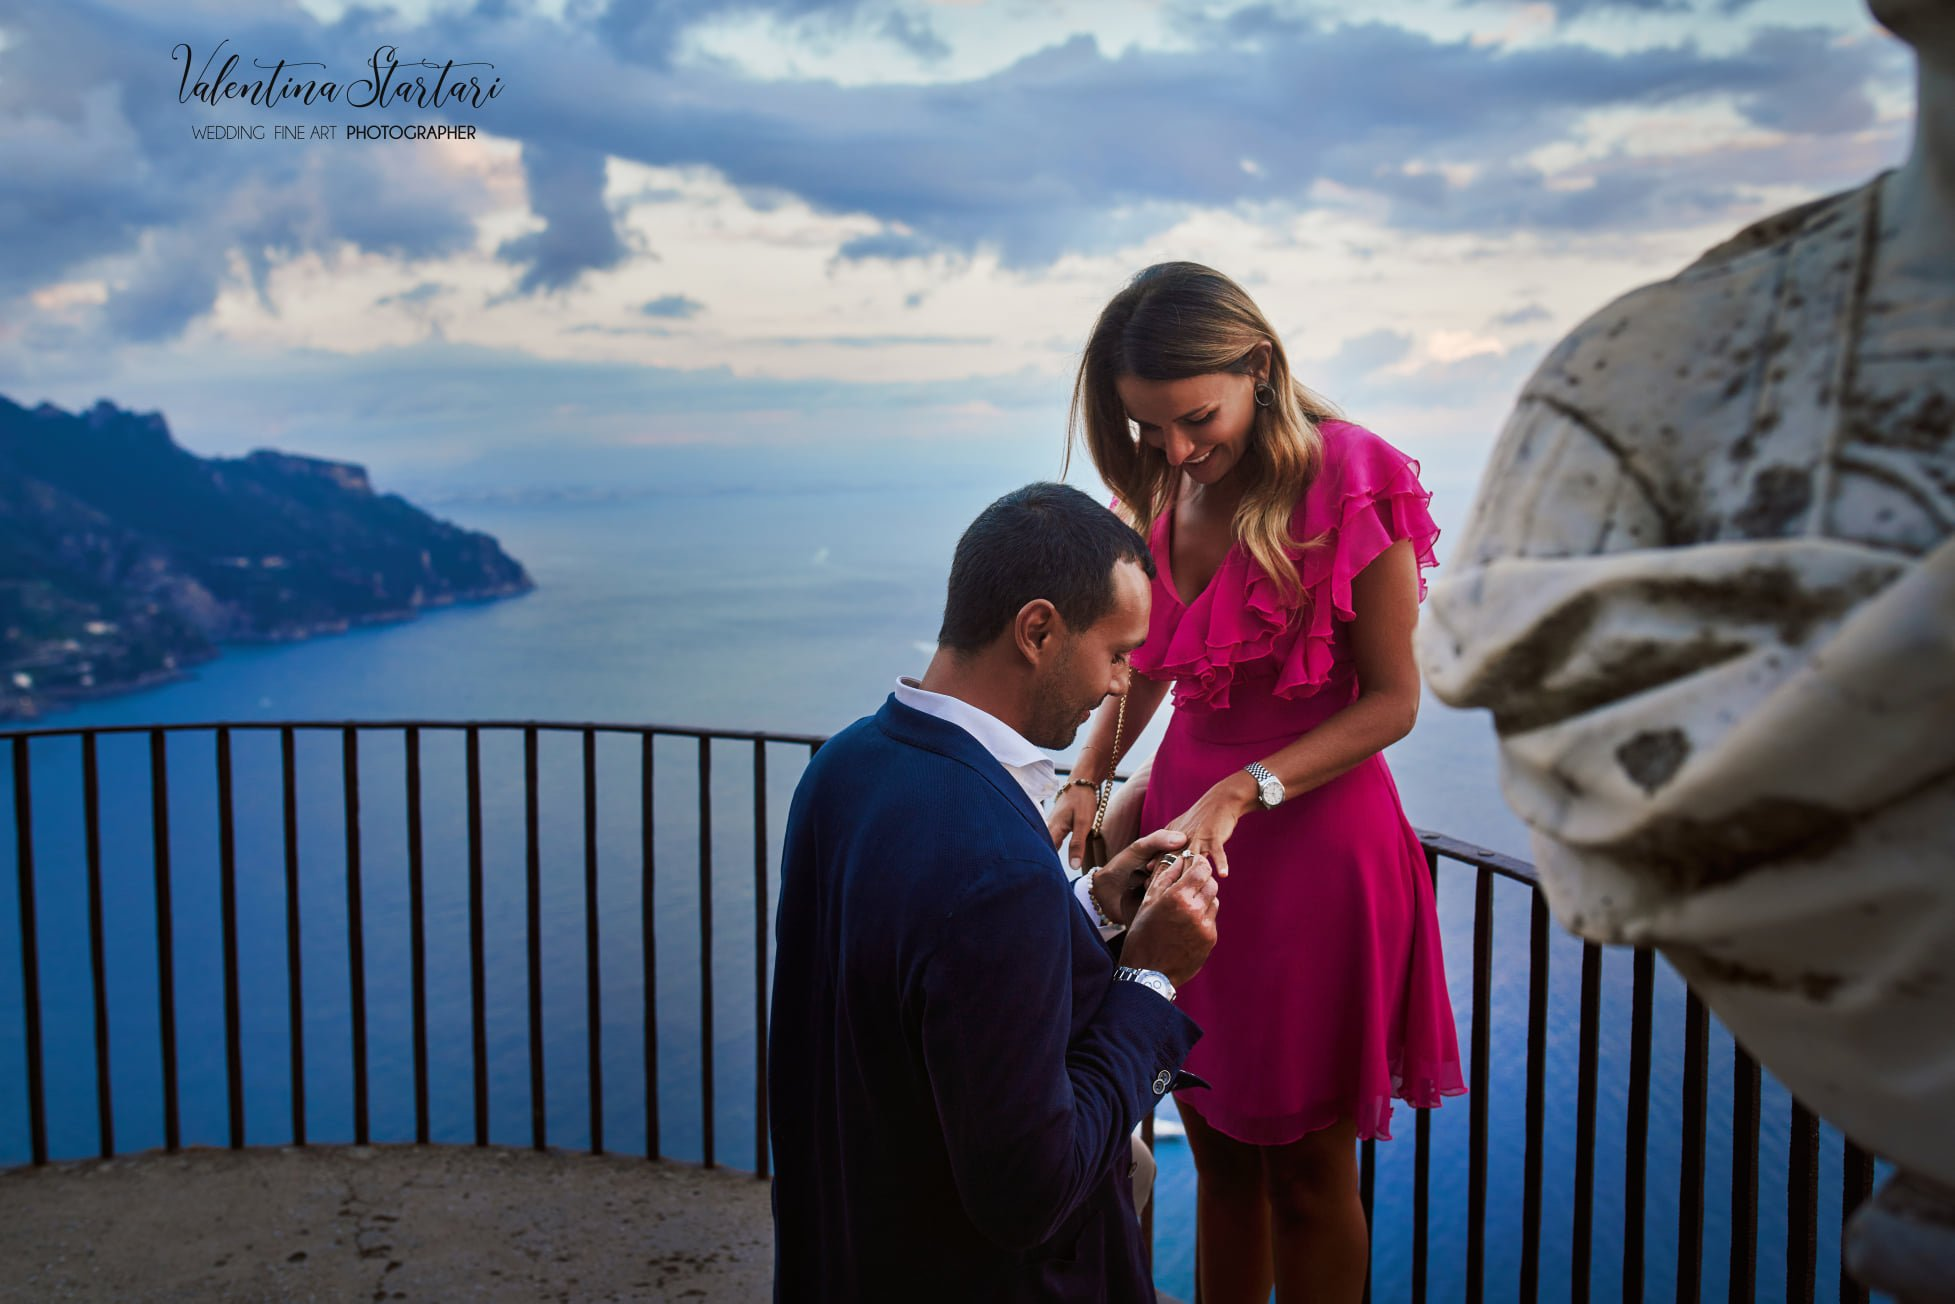 consigli proposta matrimonio